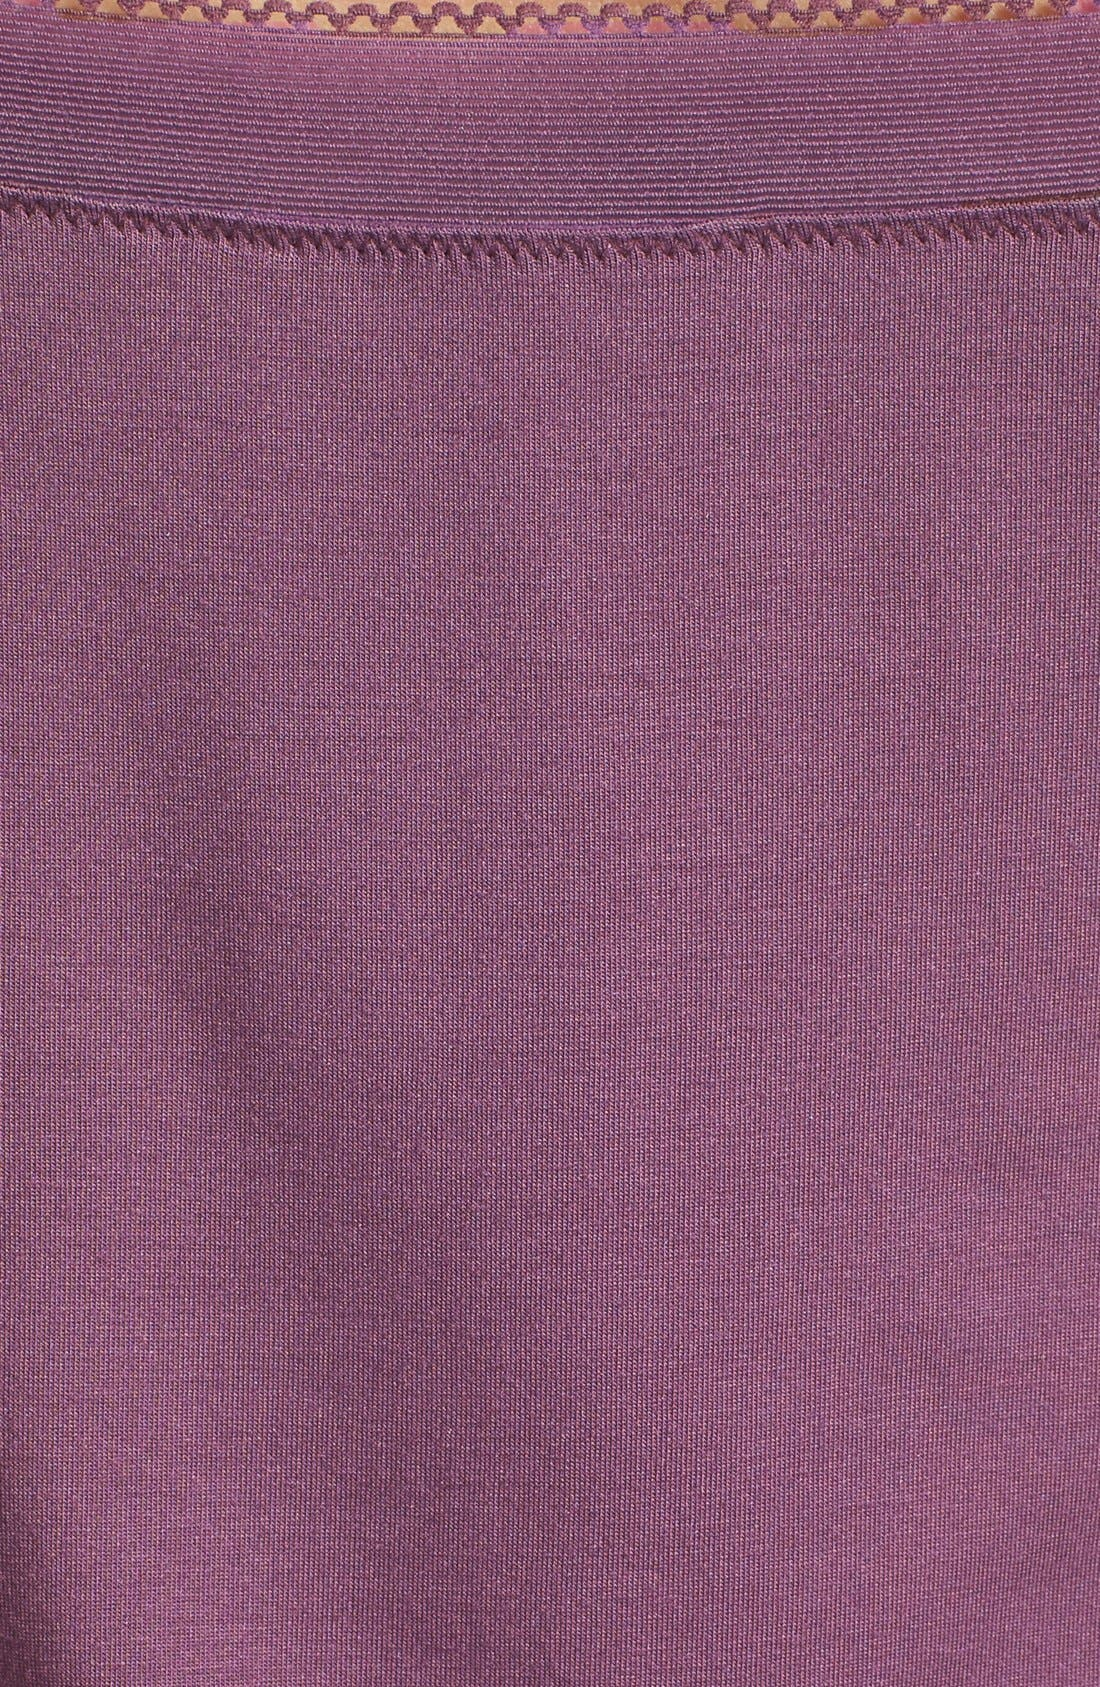 Alternate Image 5  - Calvin Klein 'Icon' Camisole